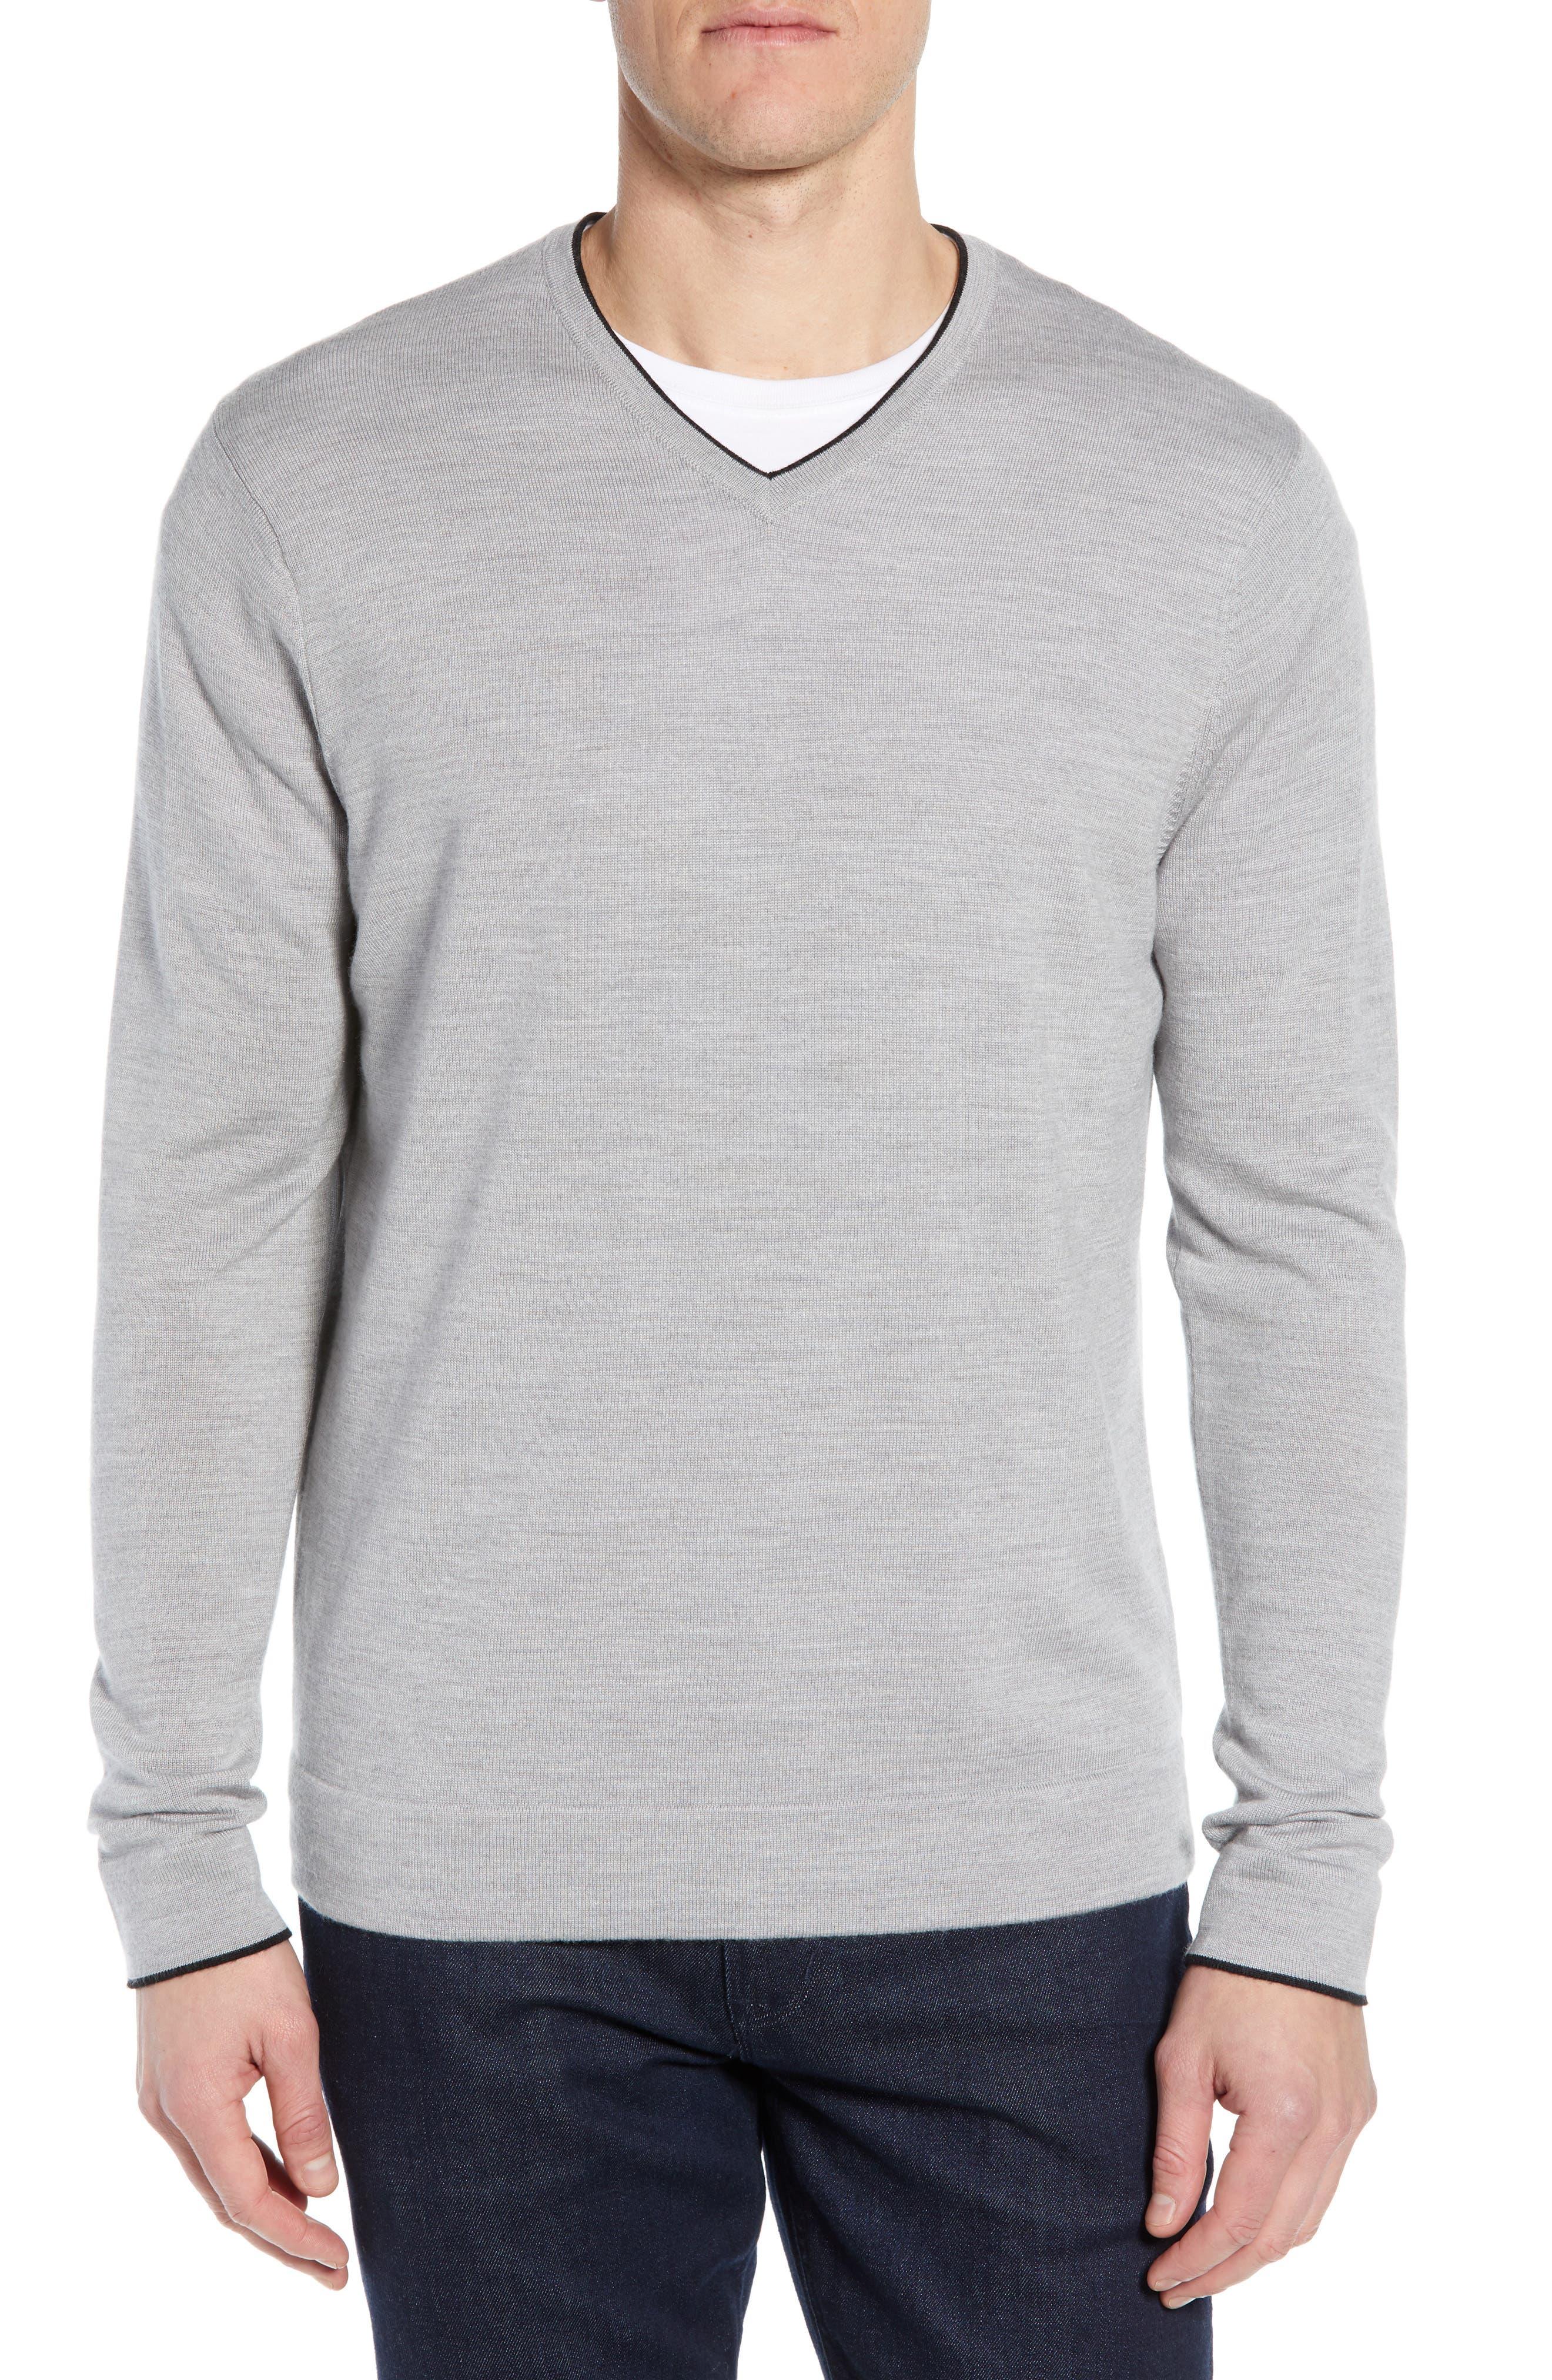 Nordstrom Signature Merino Wool Blend V-Neck Sweater, Grey